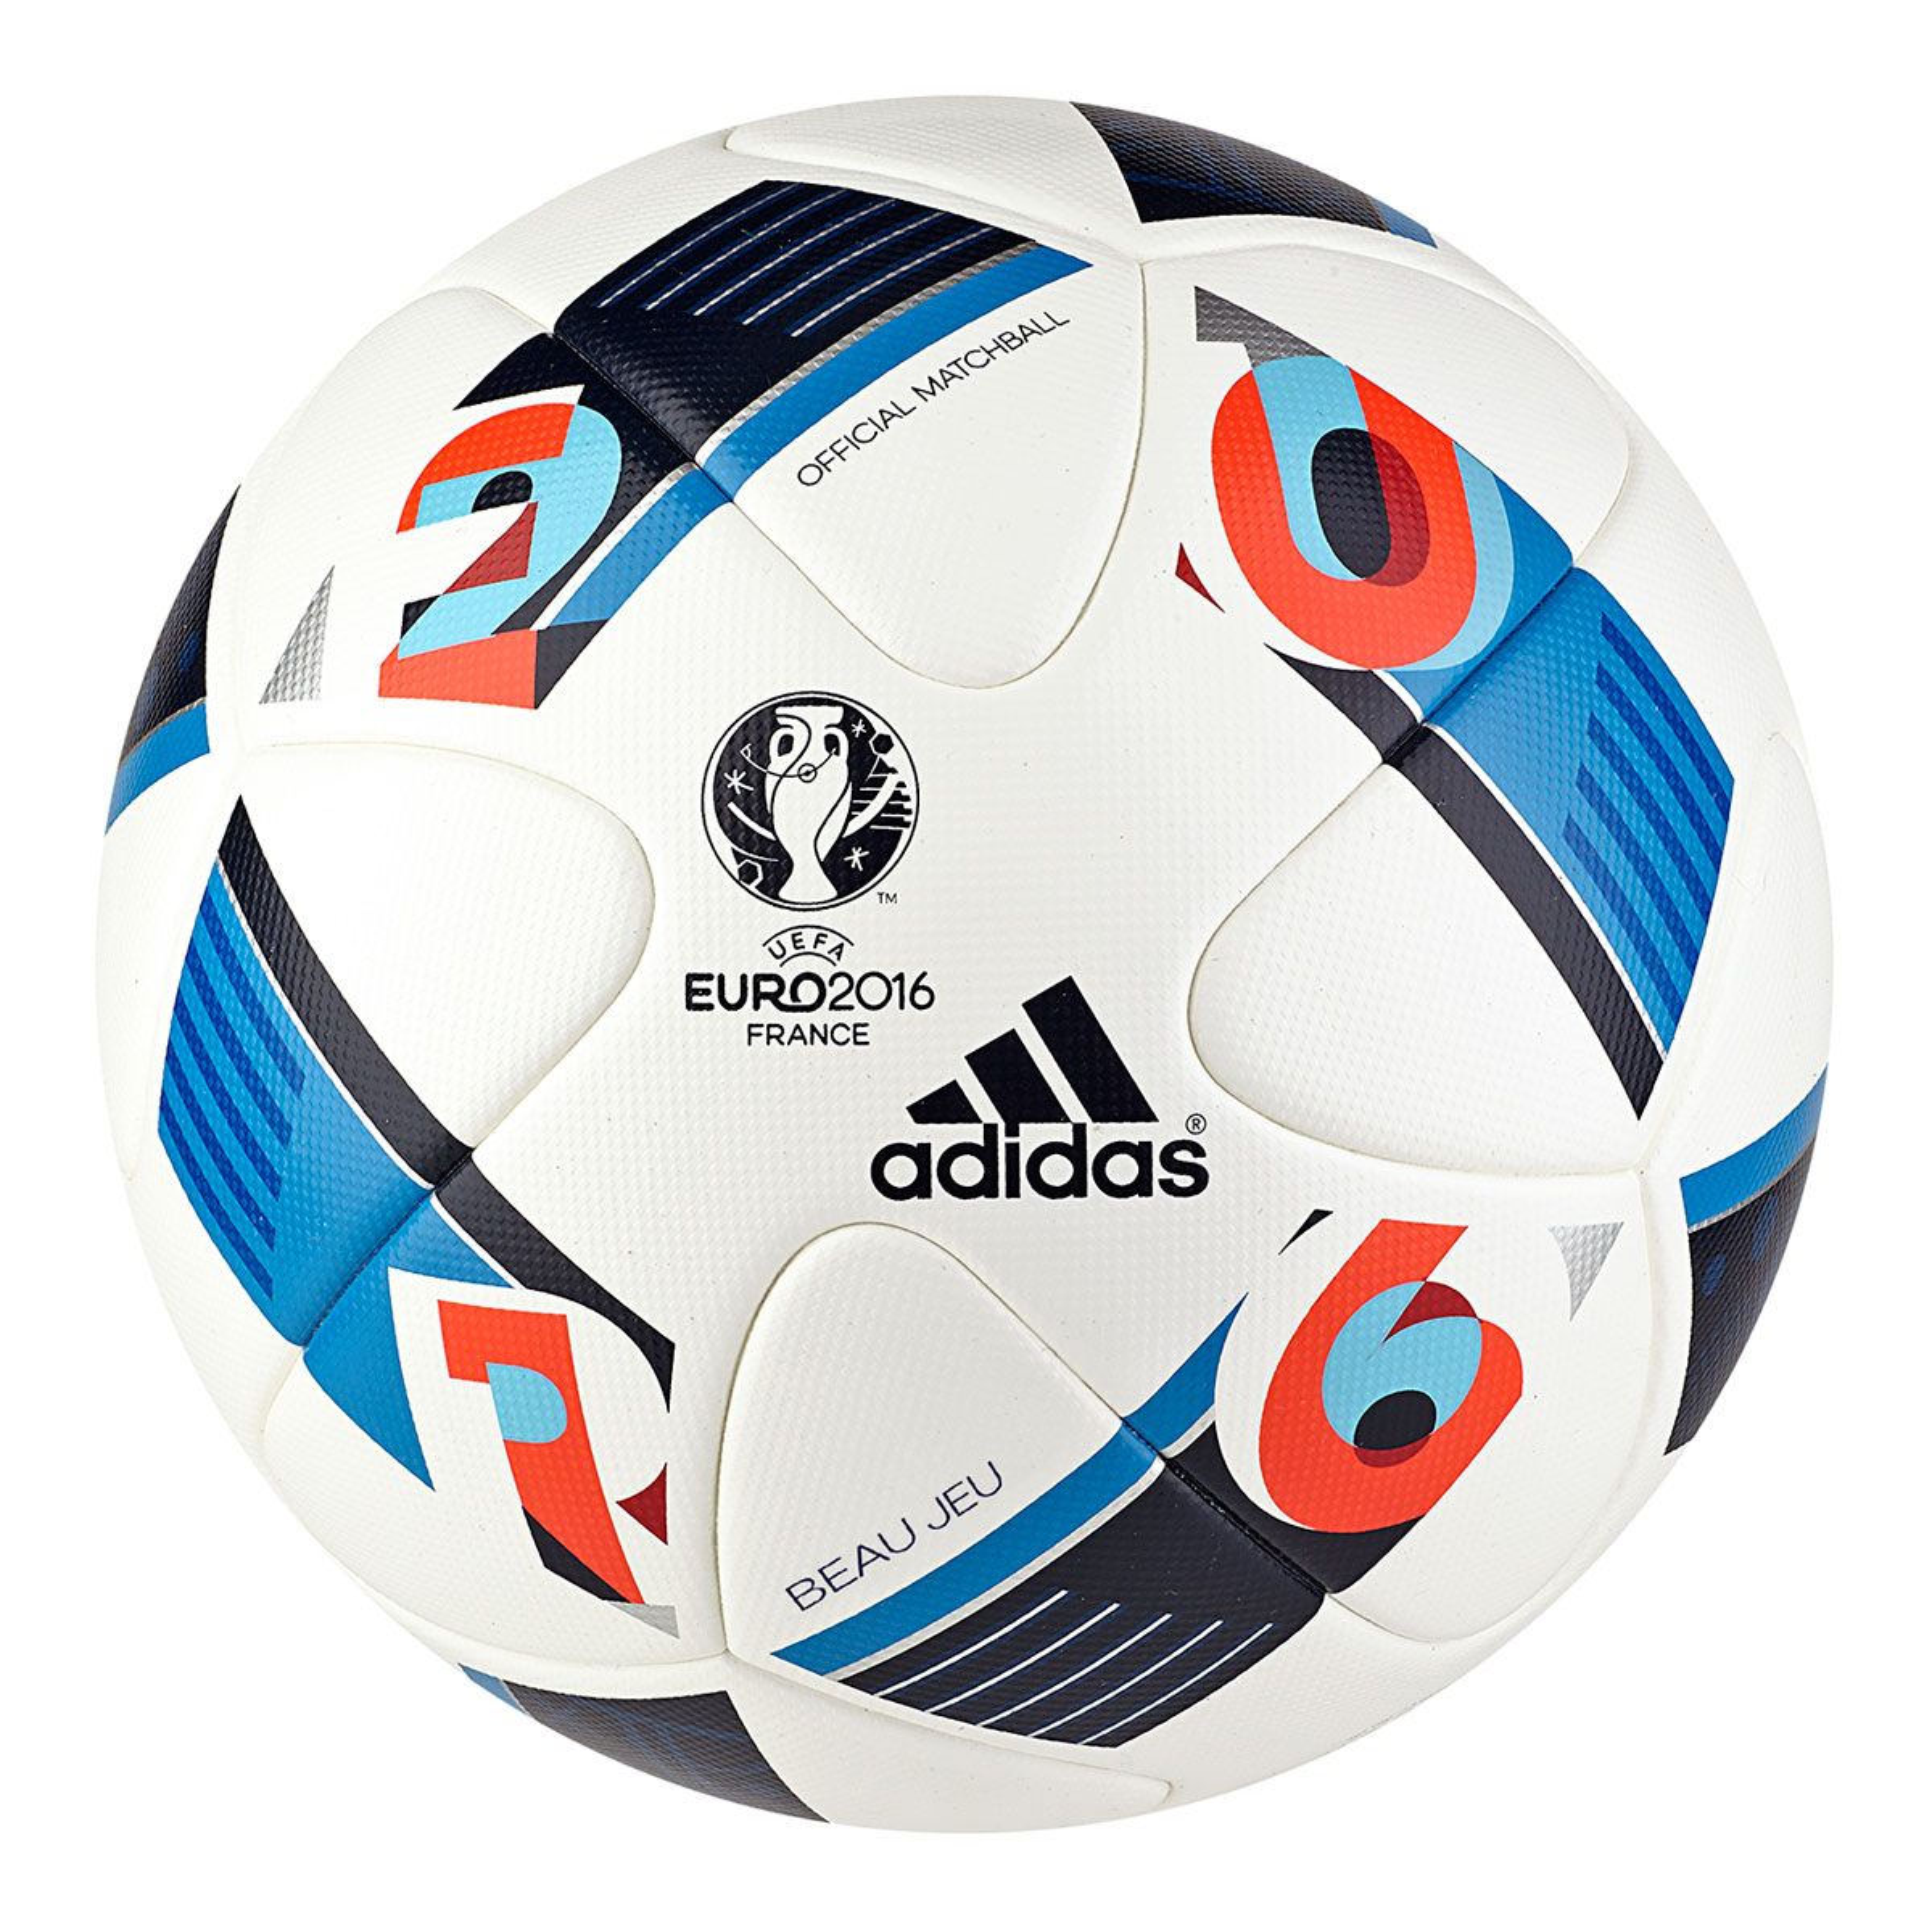 591d75aa1b3 Adidas Euro 2016 Voetbal - Ballen - Accessoires - Voetbal ...